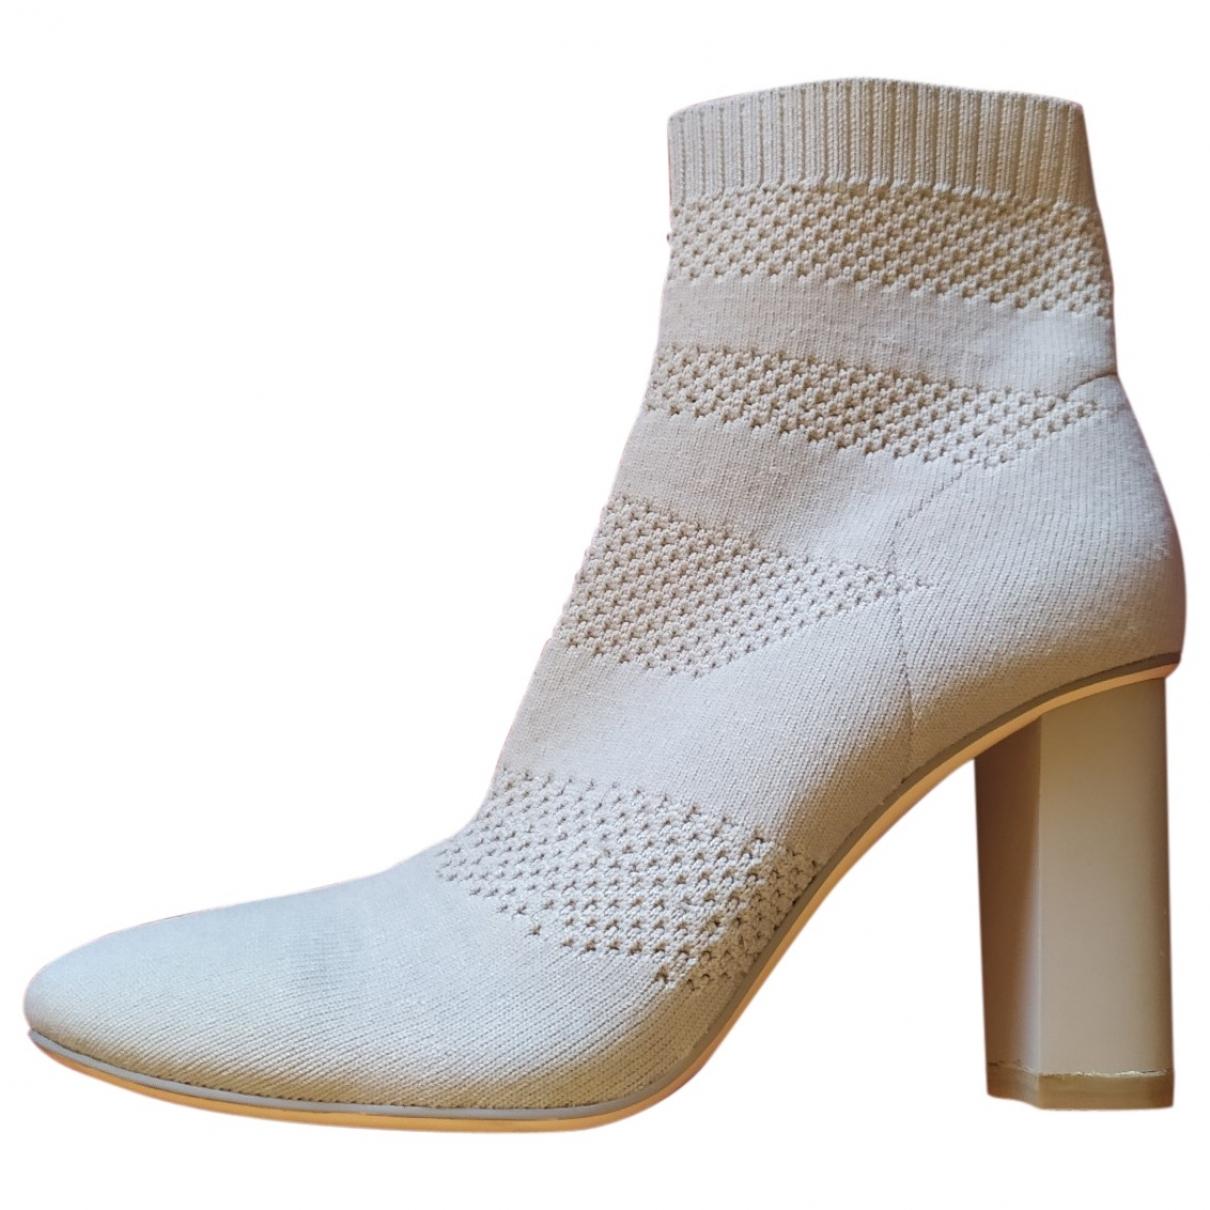 Zara \N Beige Cloth Ankle boots for Women 36 EU